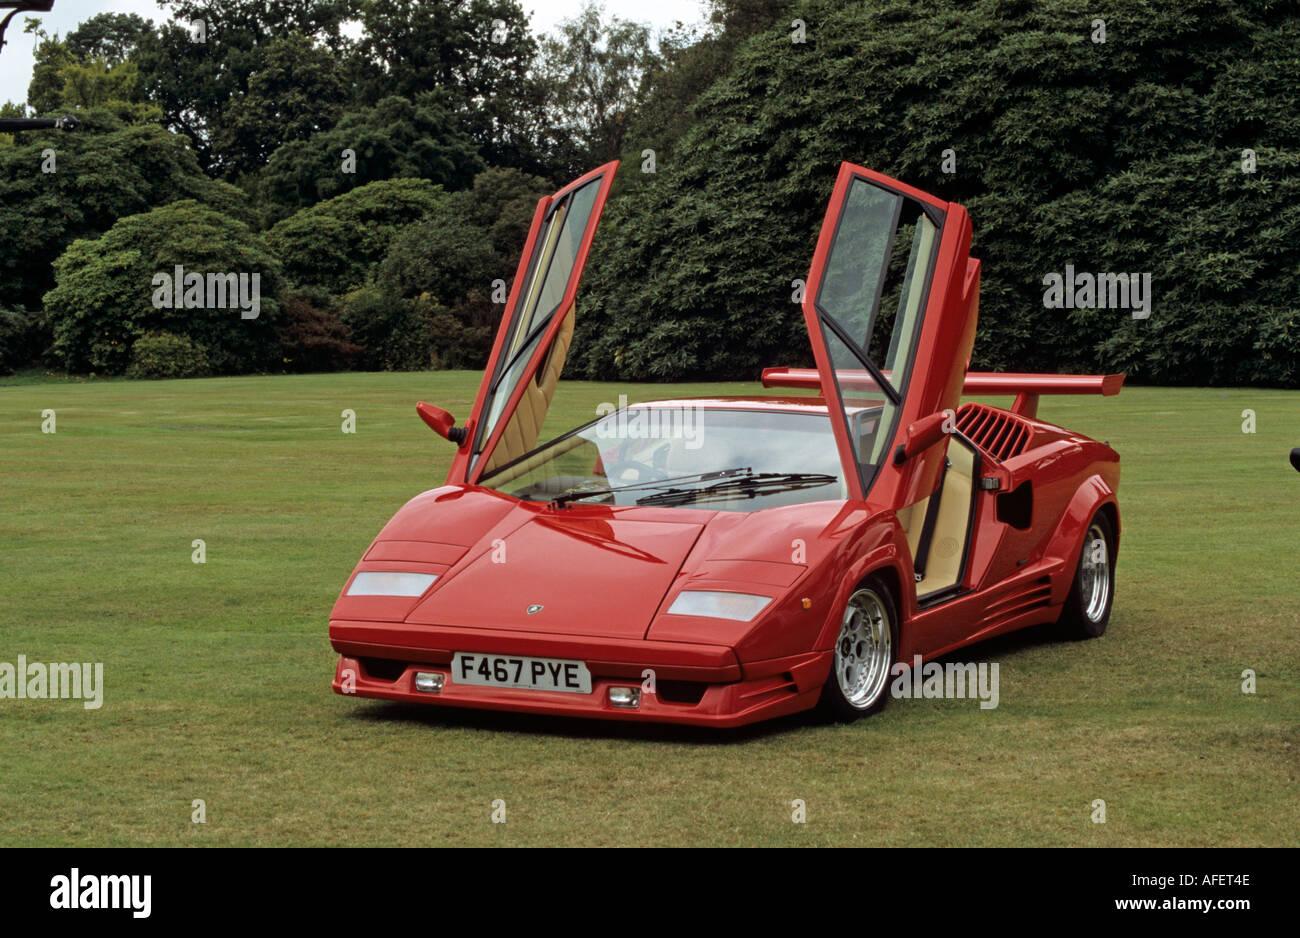 Lamborghini Countach Anniversary 1988 To 90 Stock Photo 4546637 Alamy